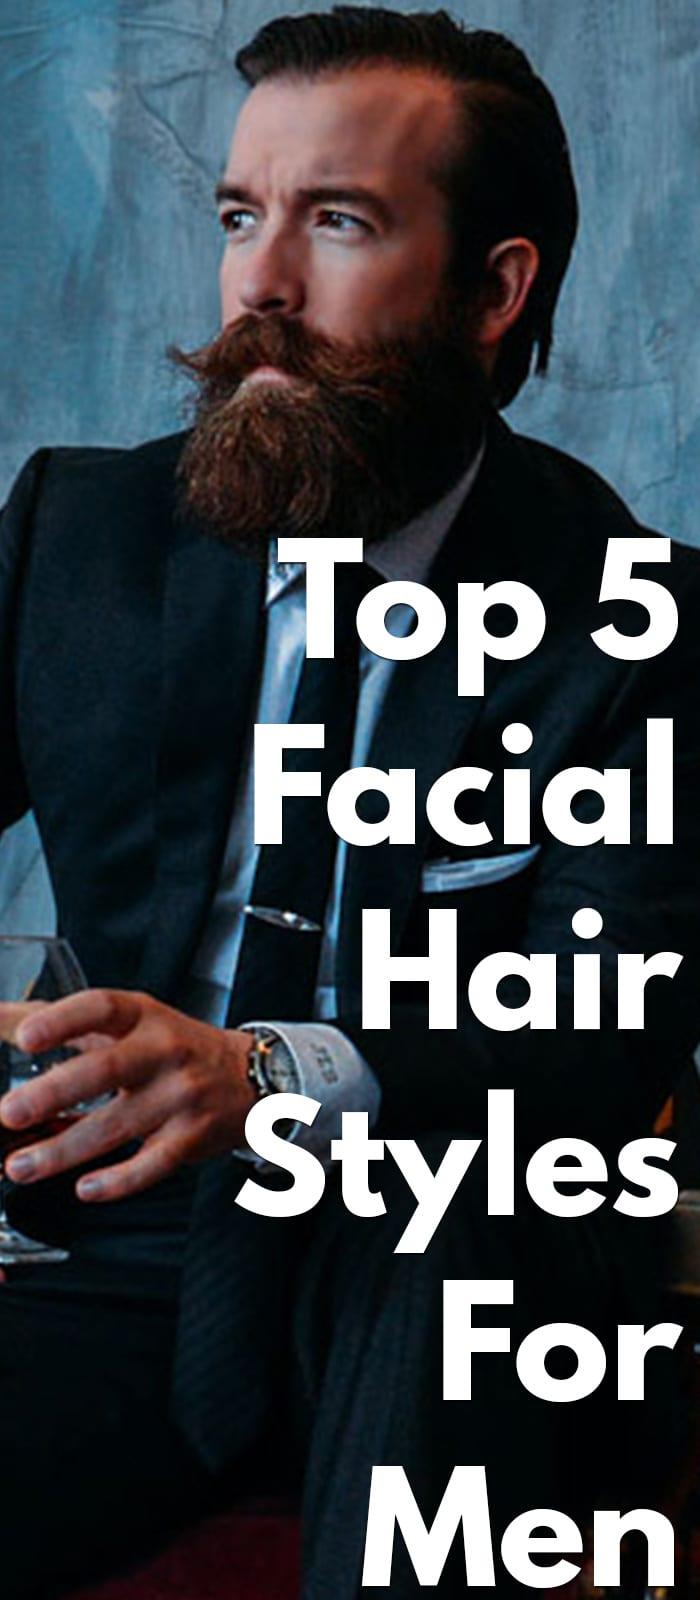 5 Amazing Facial Hair Styles - Moustache, Stubble Beard, Long Beard, Etc